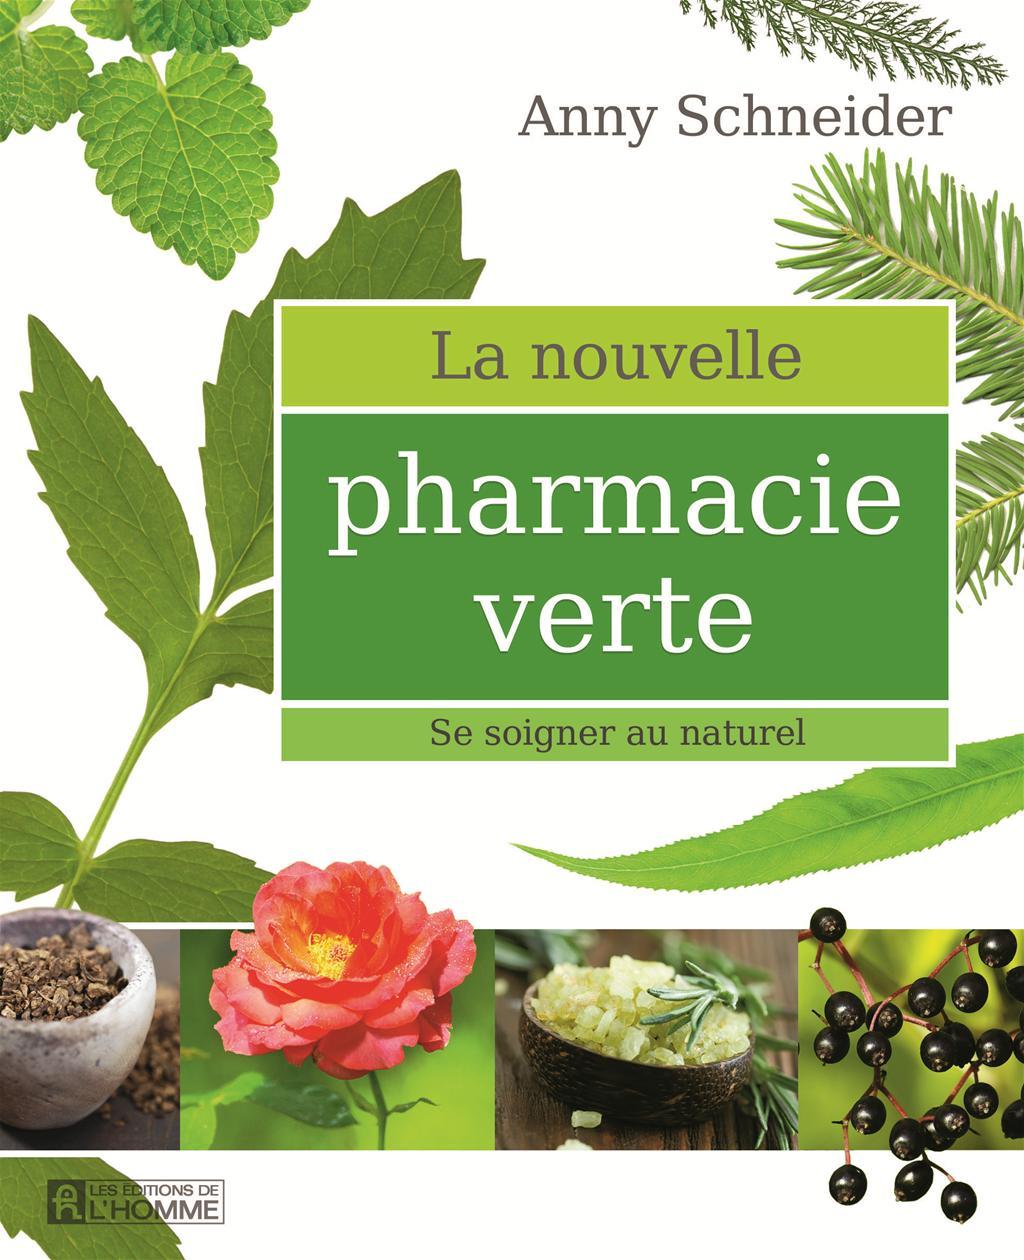 La nouvelle pharmacie verte